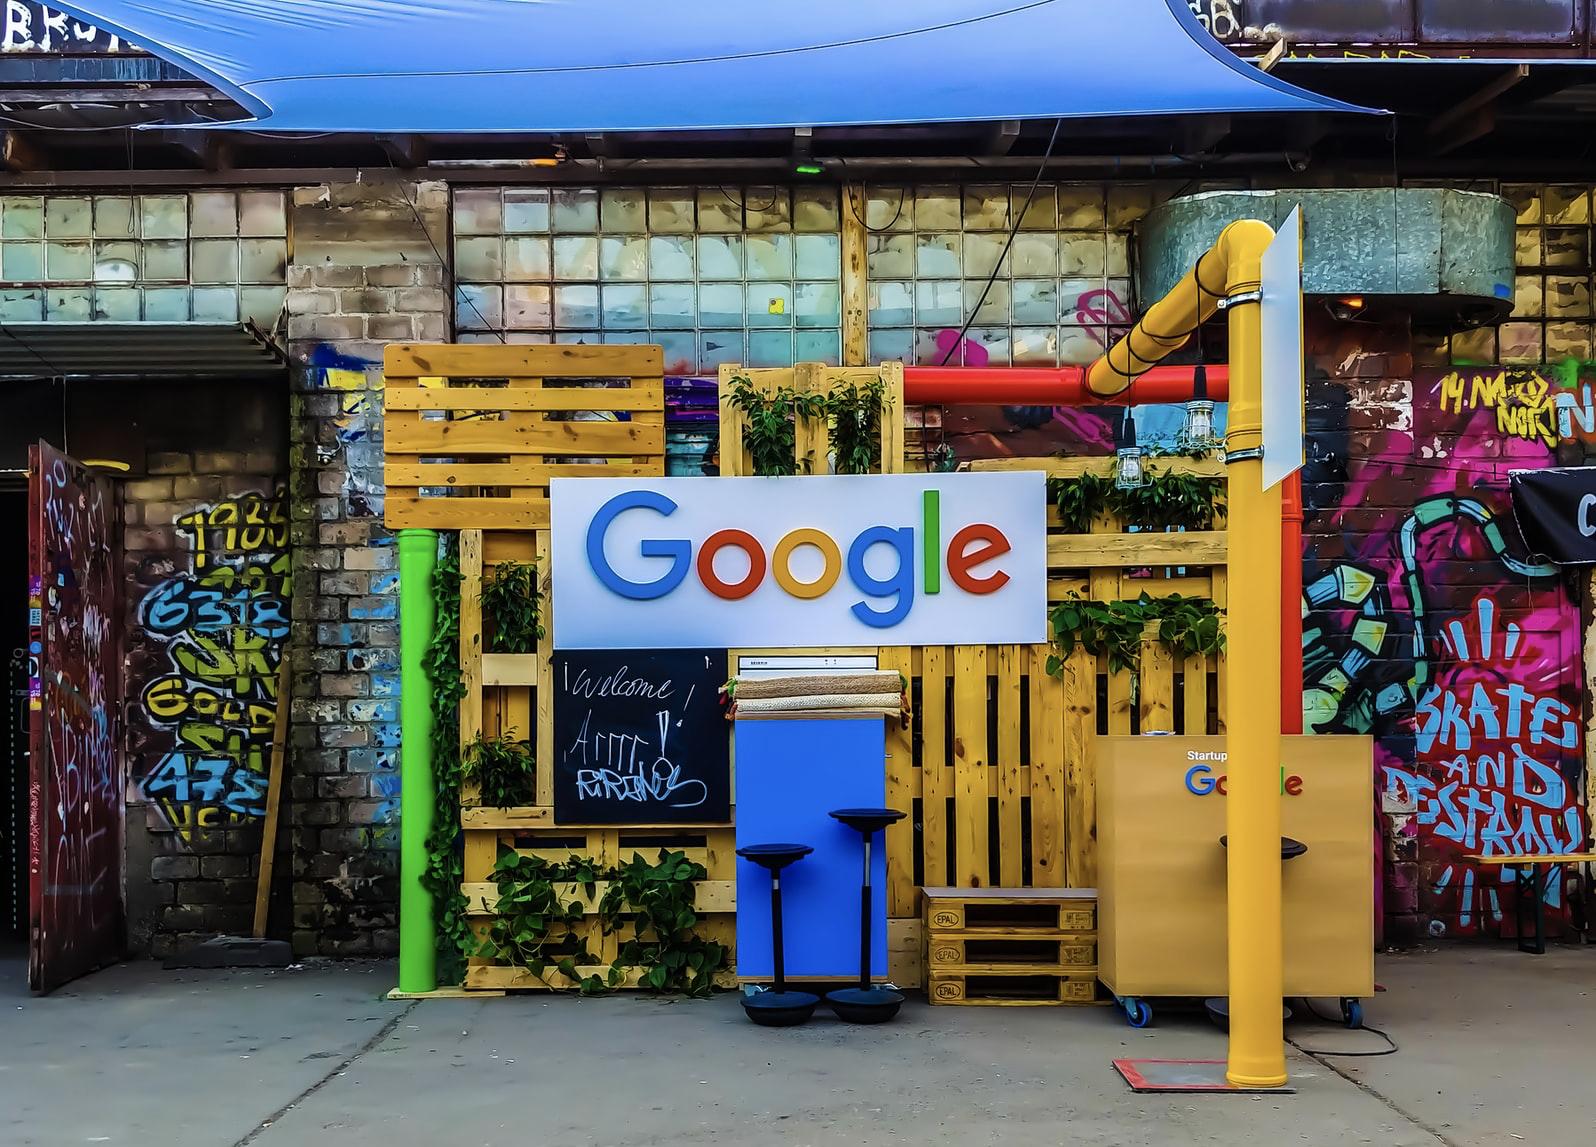 Google 在 2020 年封禁了近 12 万名开发者账户